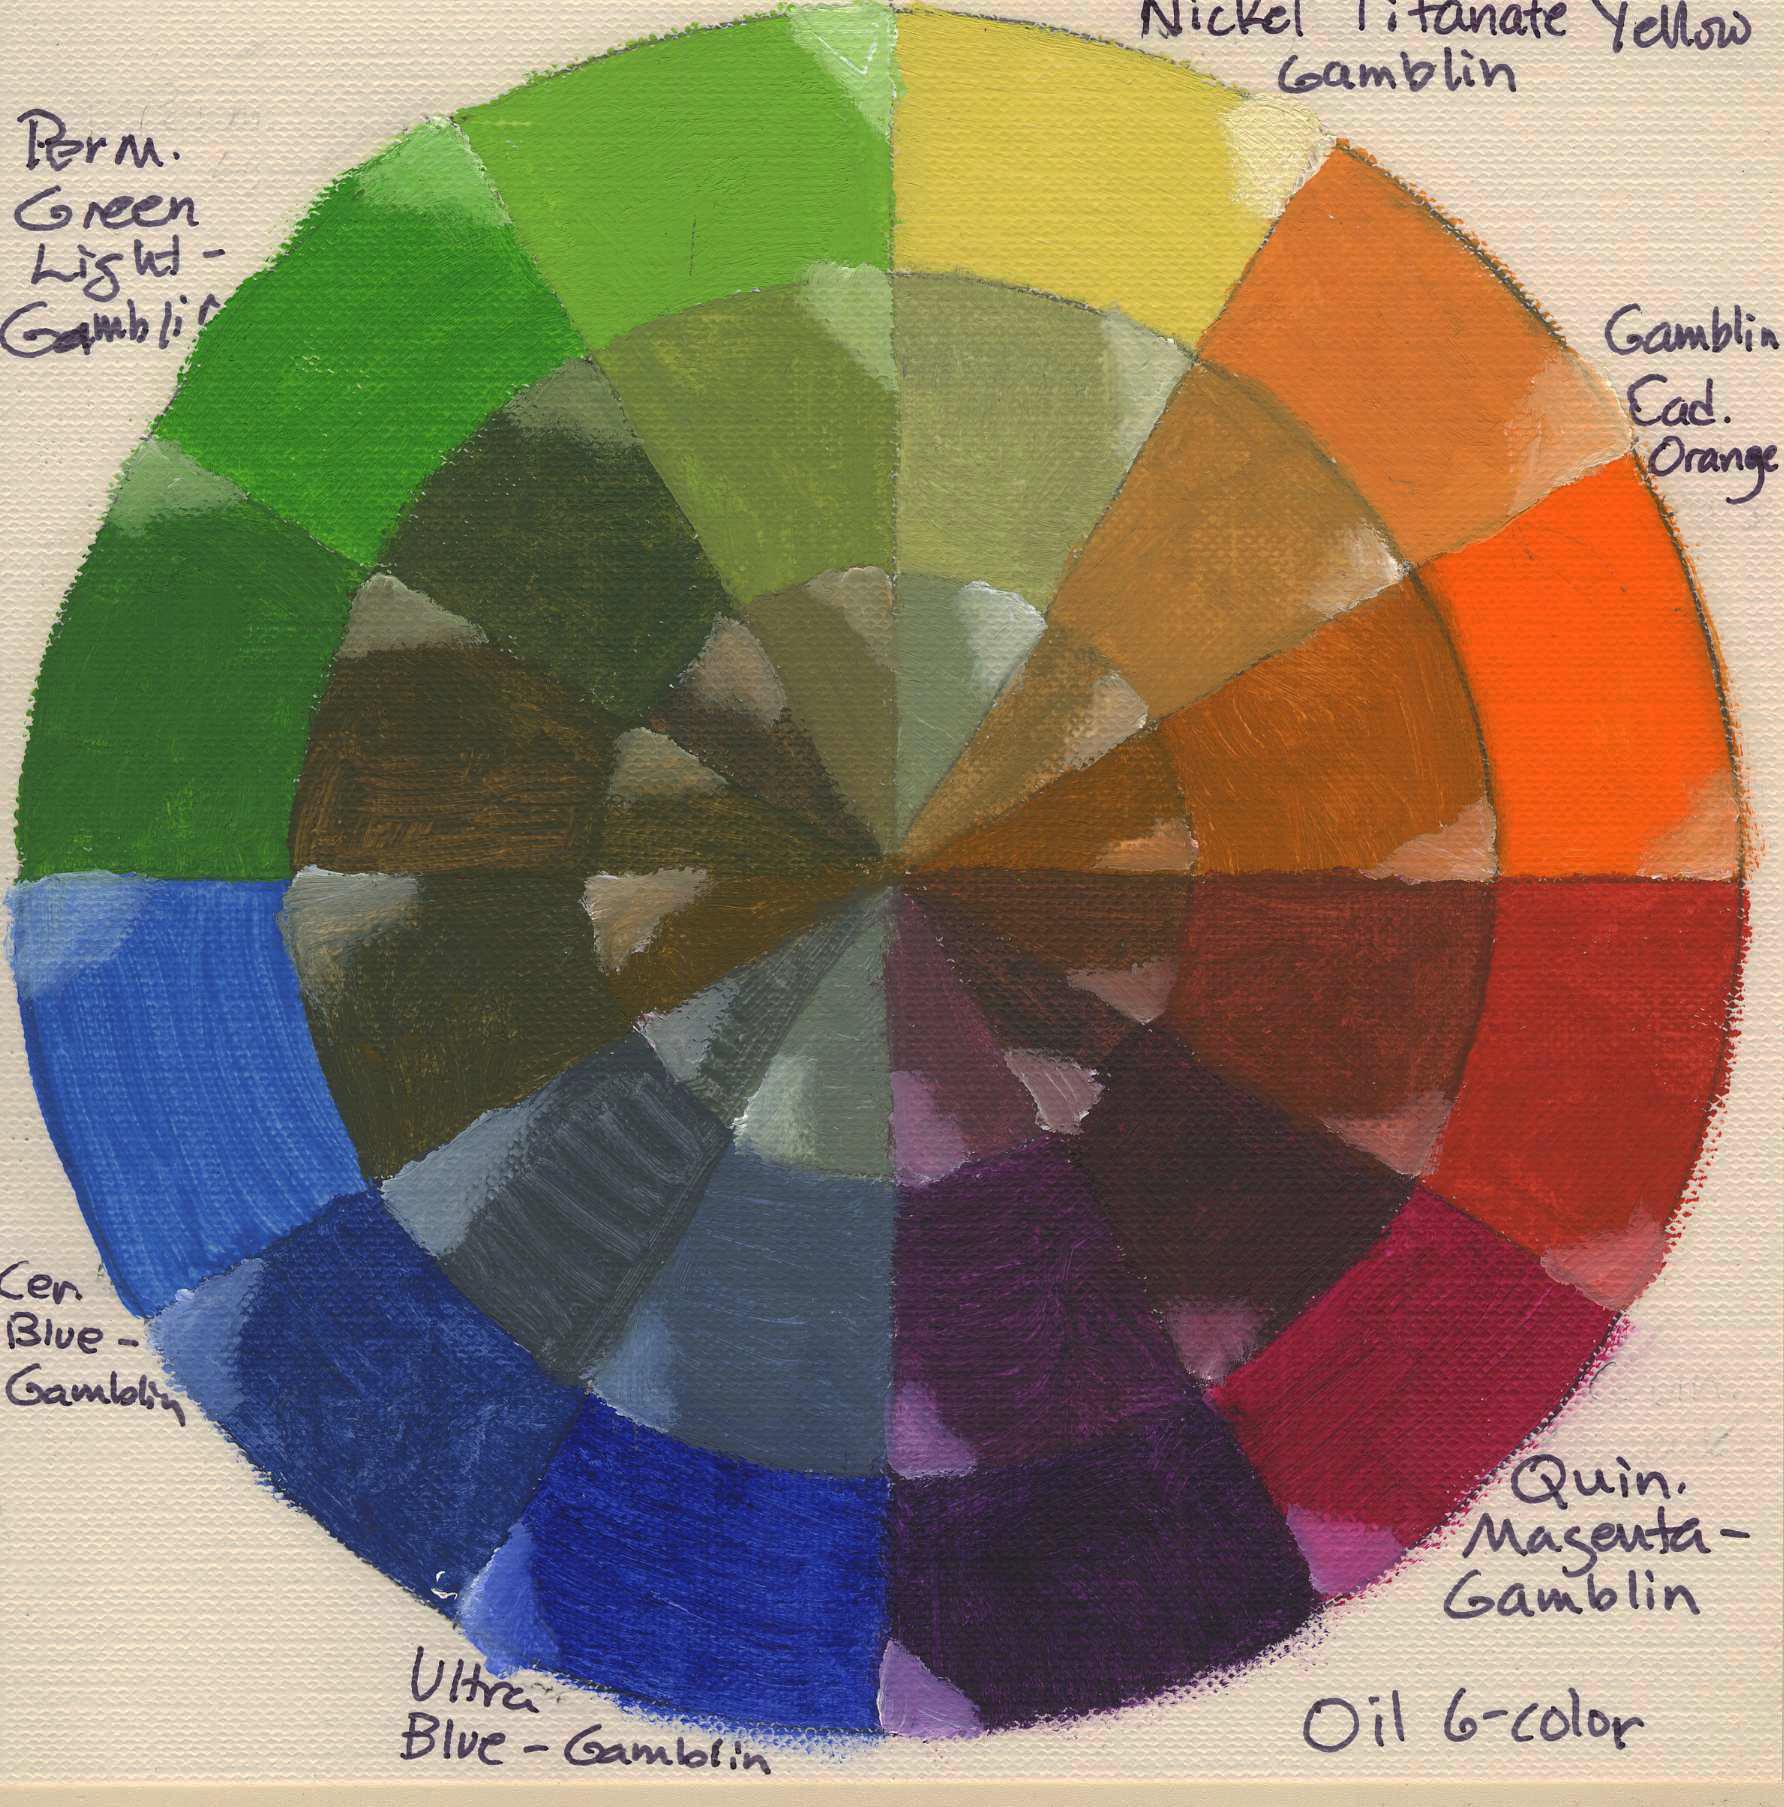 Color-mixing-chart-Oils-6-color028